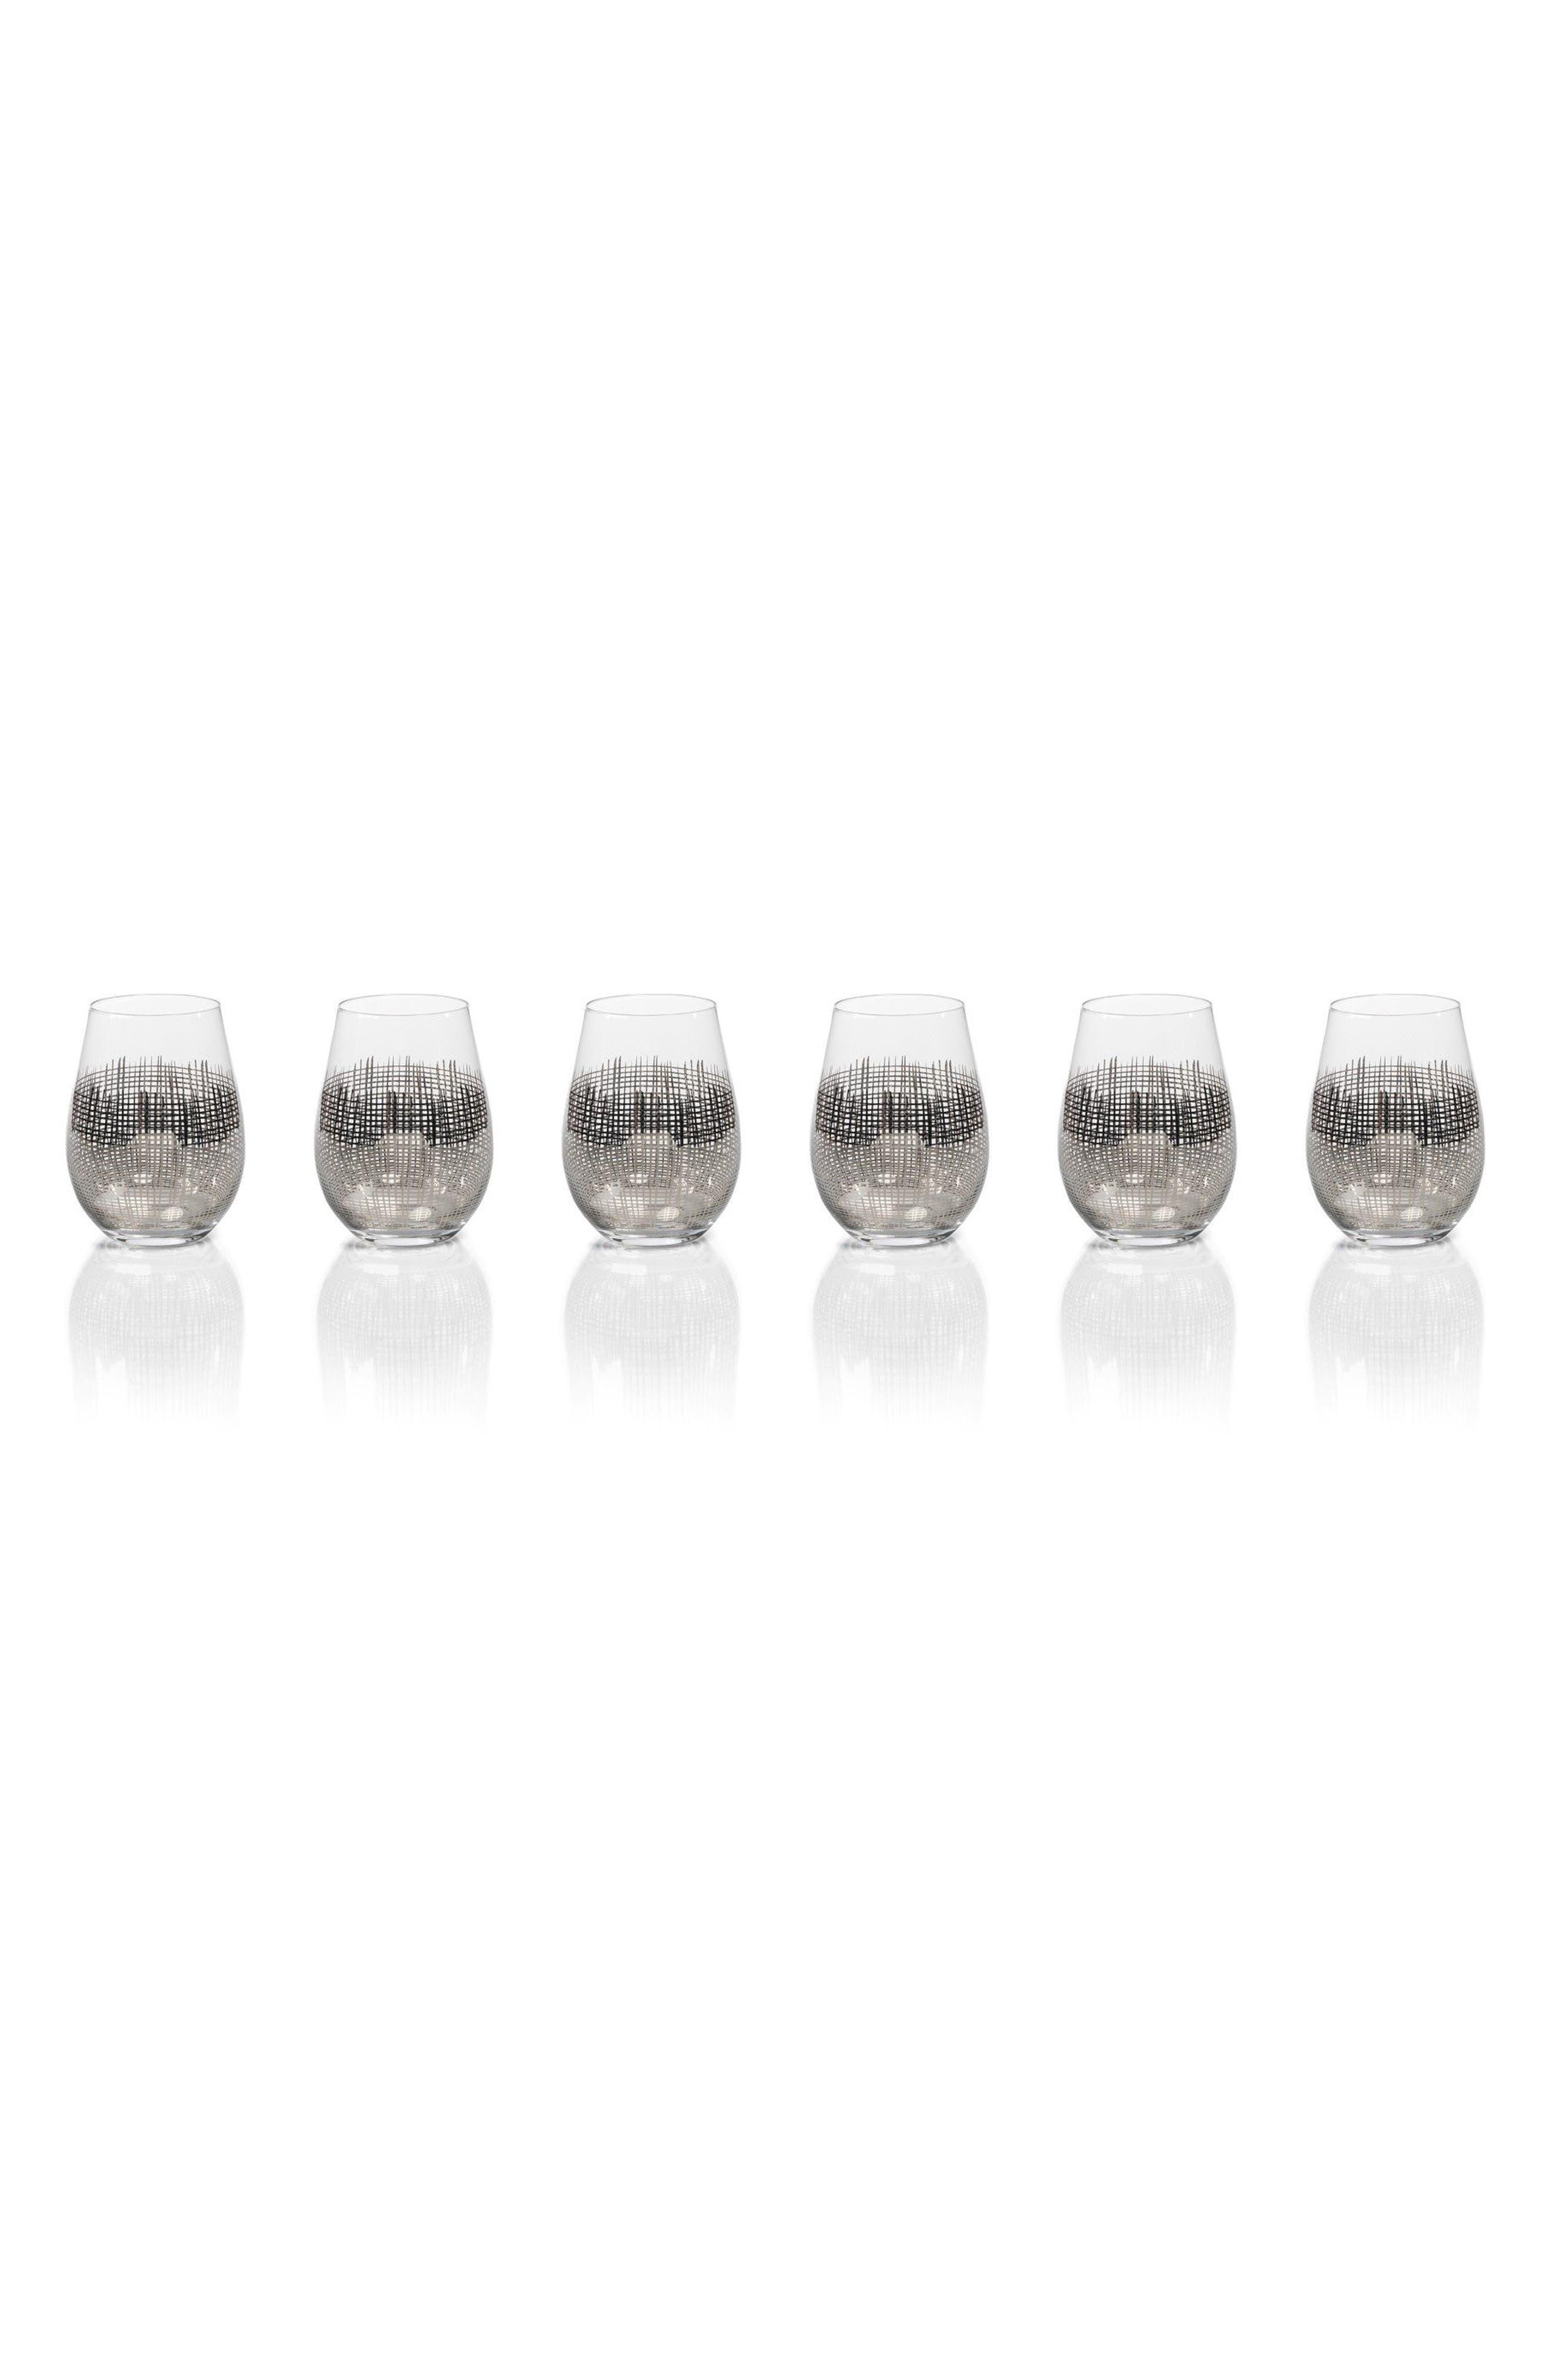 Reza Set of 6 Stemless Wine Glasses,                         Main,                         color, 040